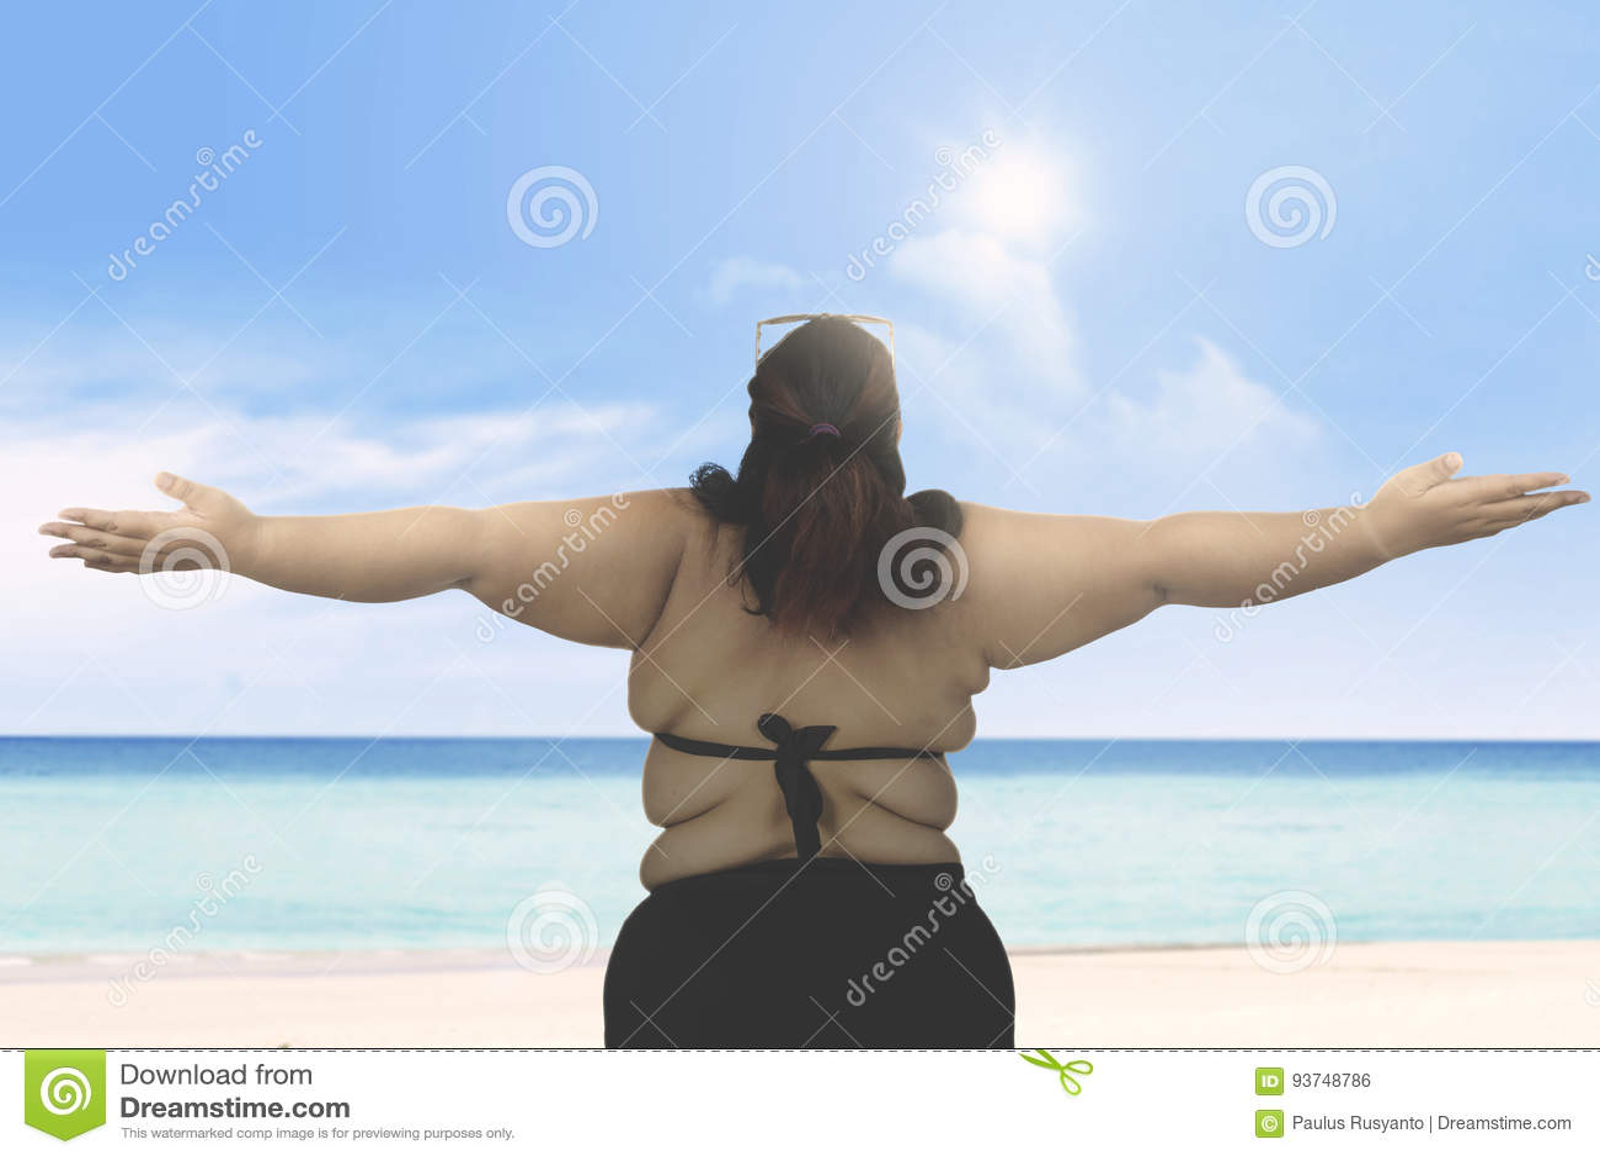 fat woman beach stock images - 674 photos